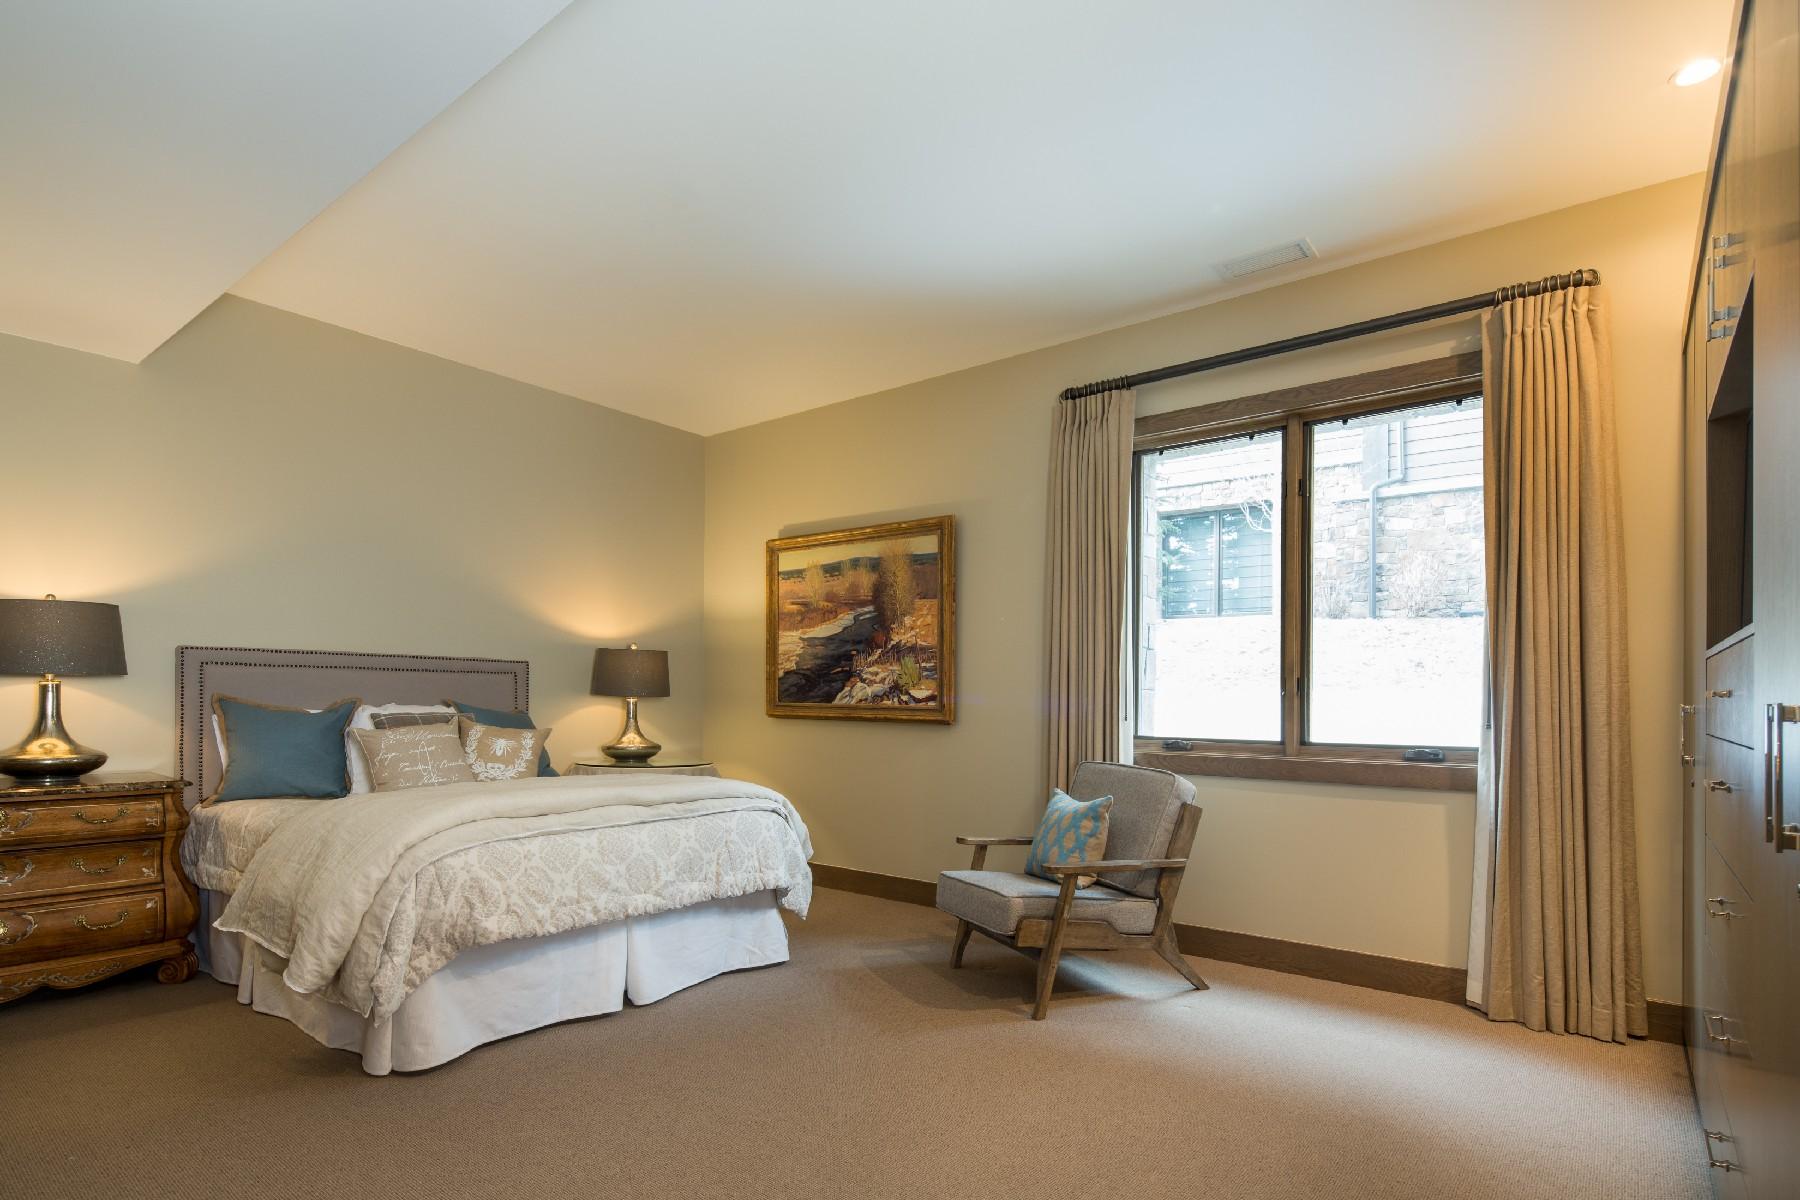 Additional photo for property listing at Prime Sun Valley Townhome 142 Clos Du Val Sun Valley, Idaho 83353 Estados Unidos